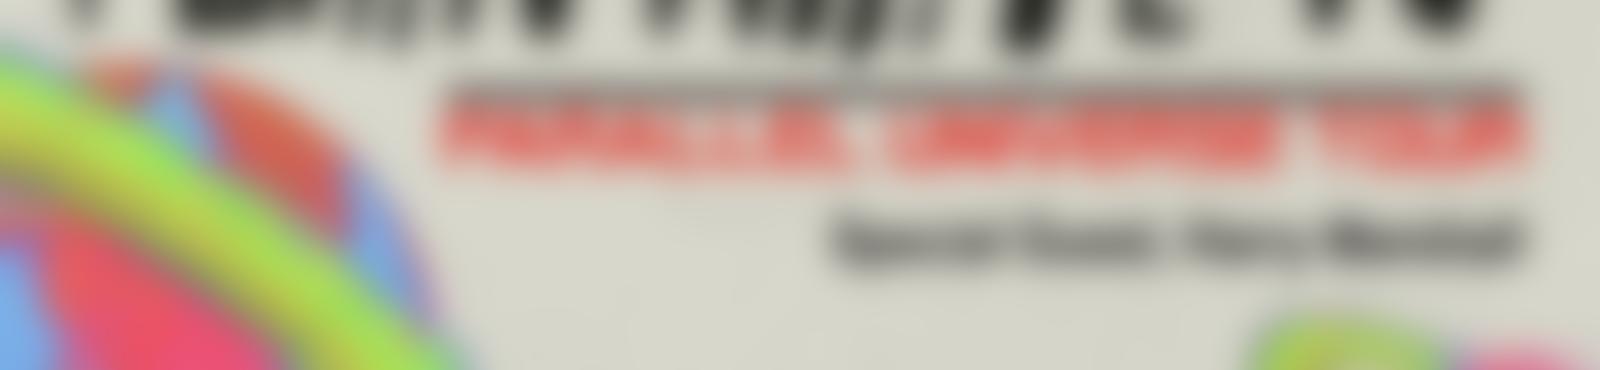 Blurred 09e2ba53 6ded 499c a140 70d05e0277ab